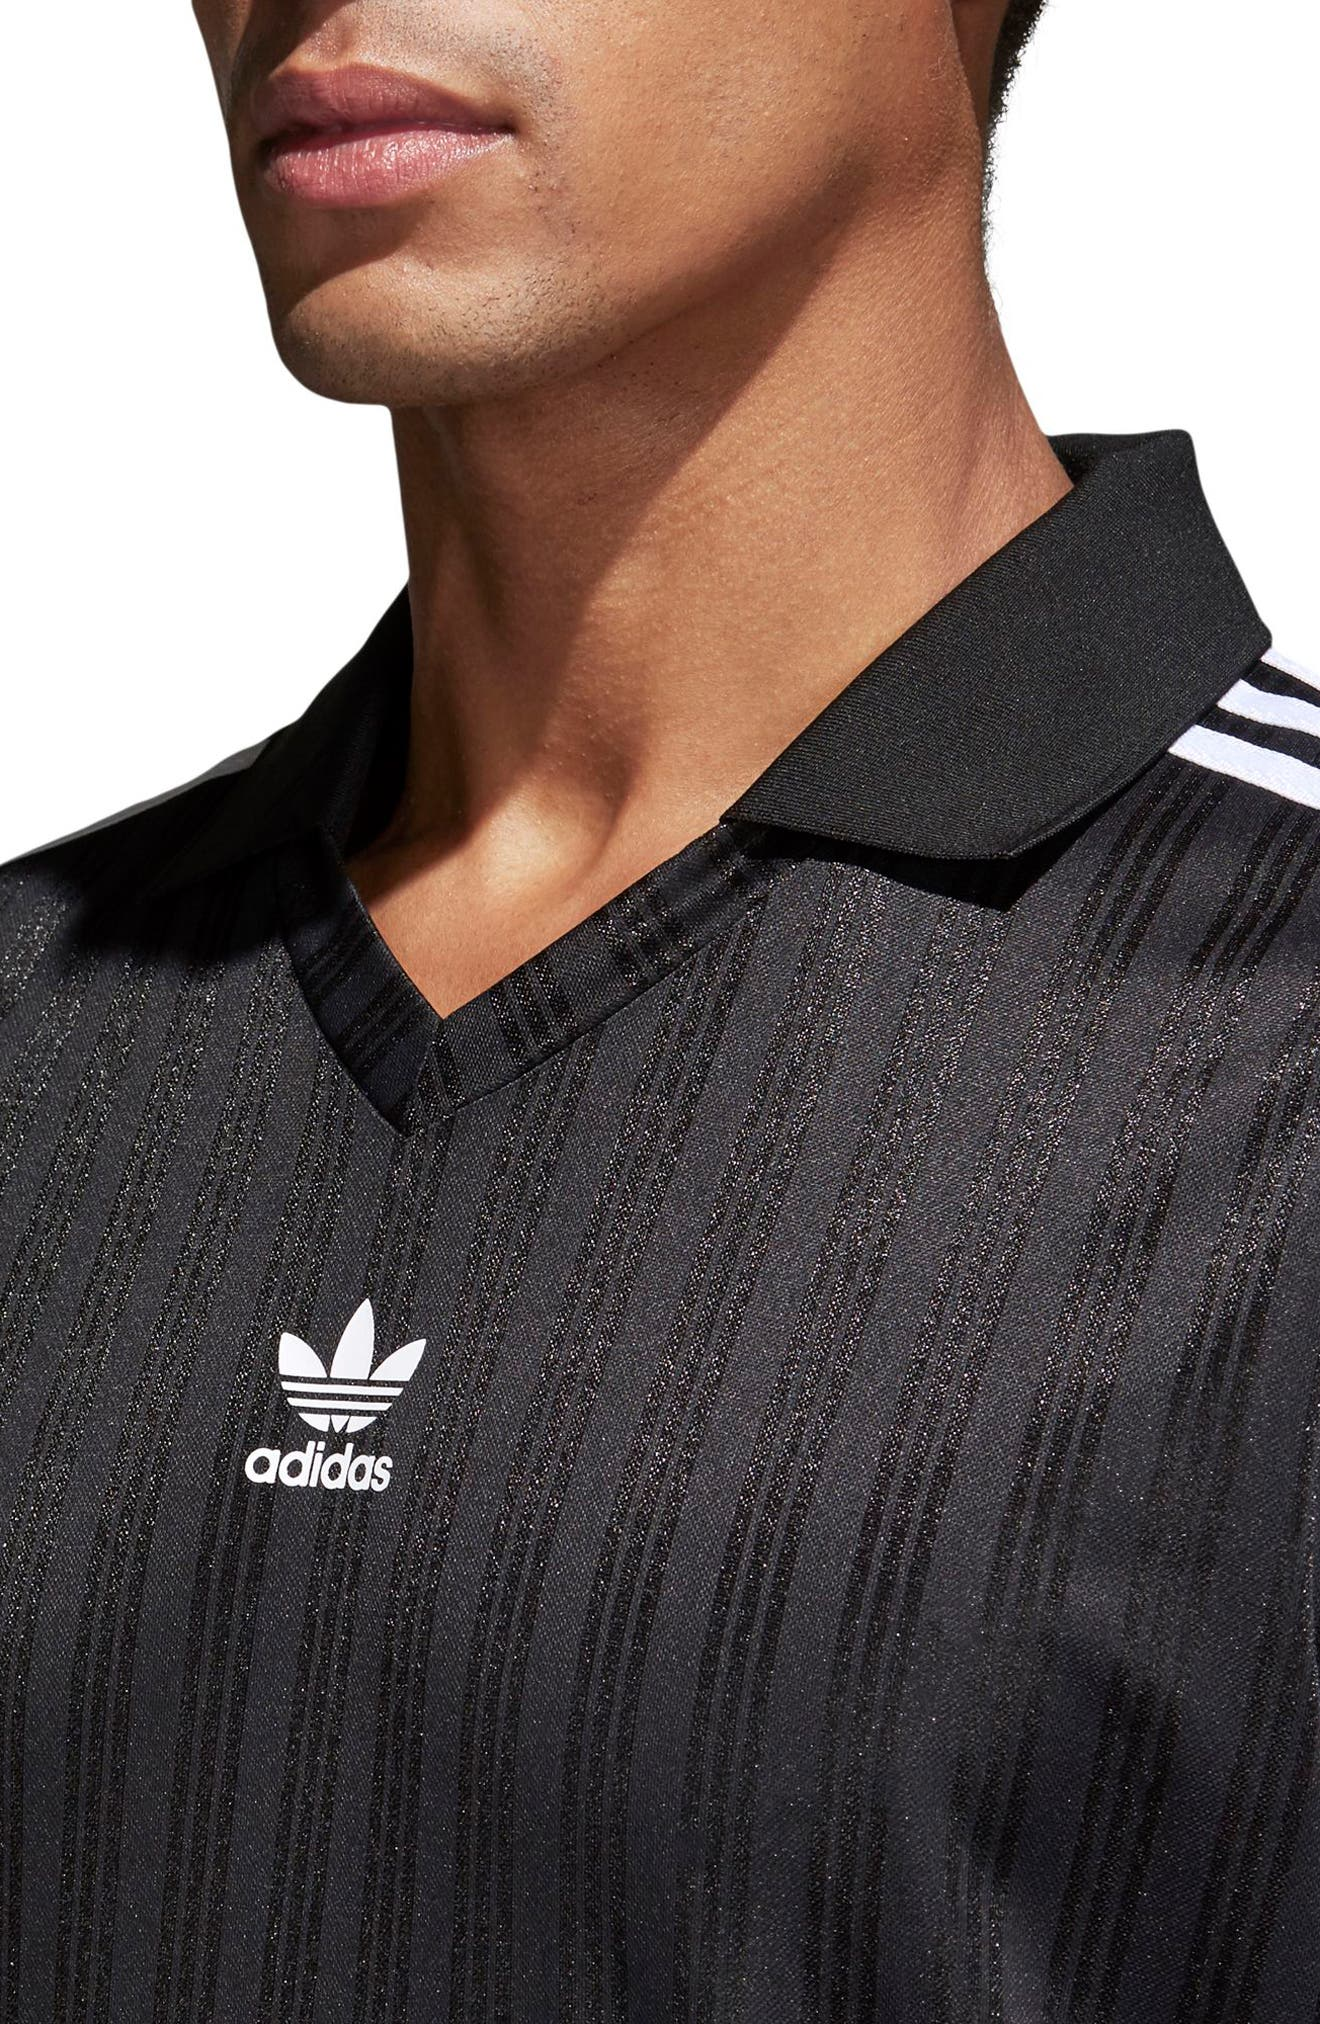 adidas Football Jersey Polo,                             Alternate thumbnail 4, color,                             Black